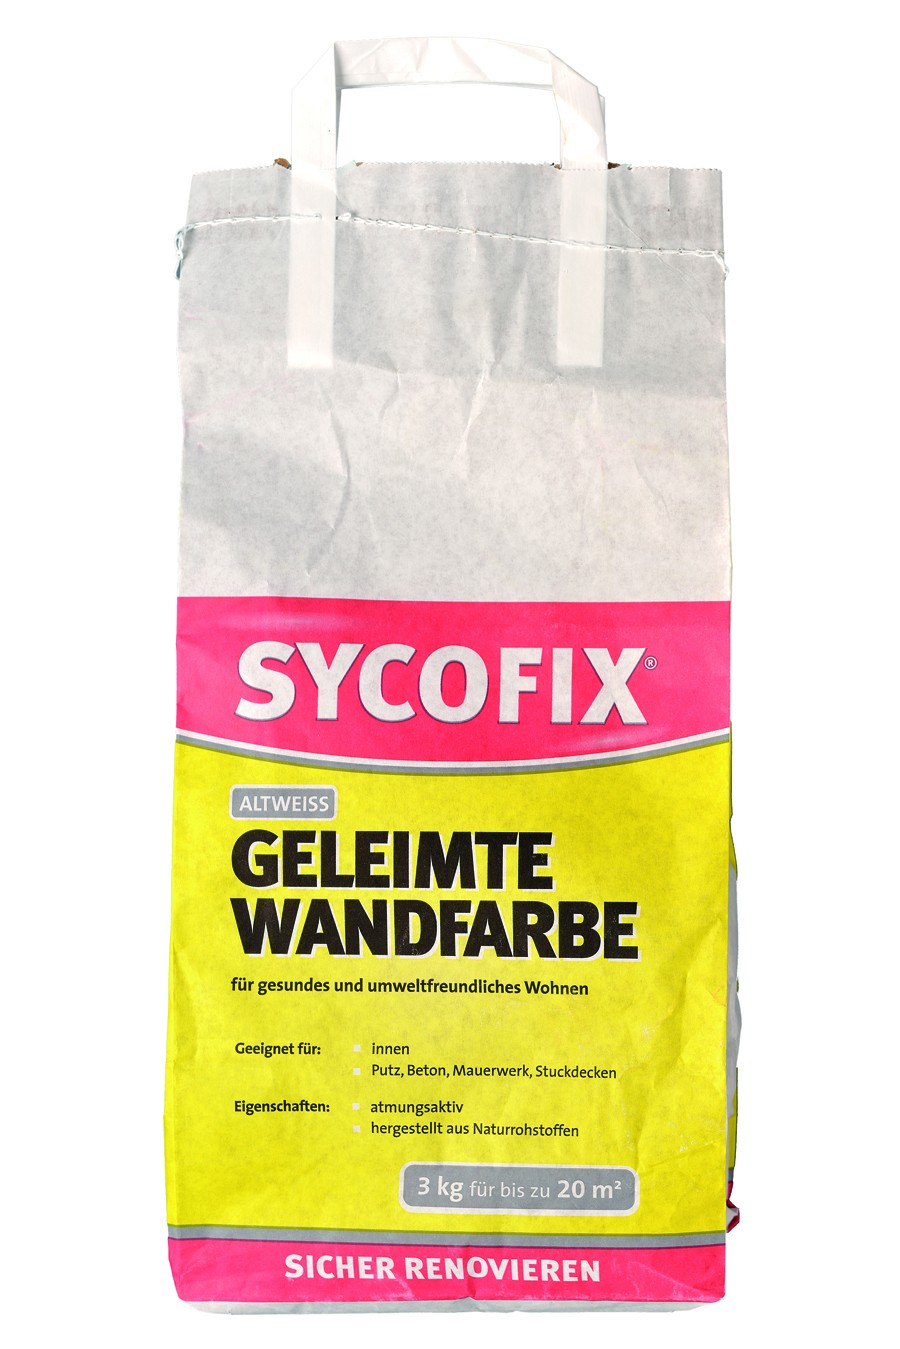 Sycofix - Geleimte Wandfarbe 3kg